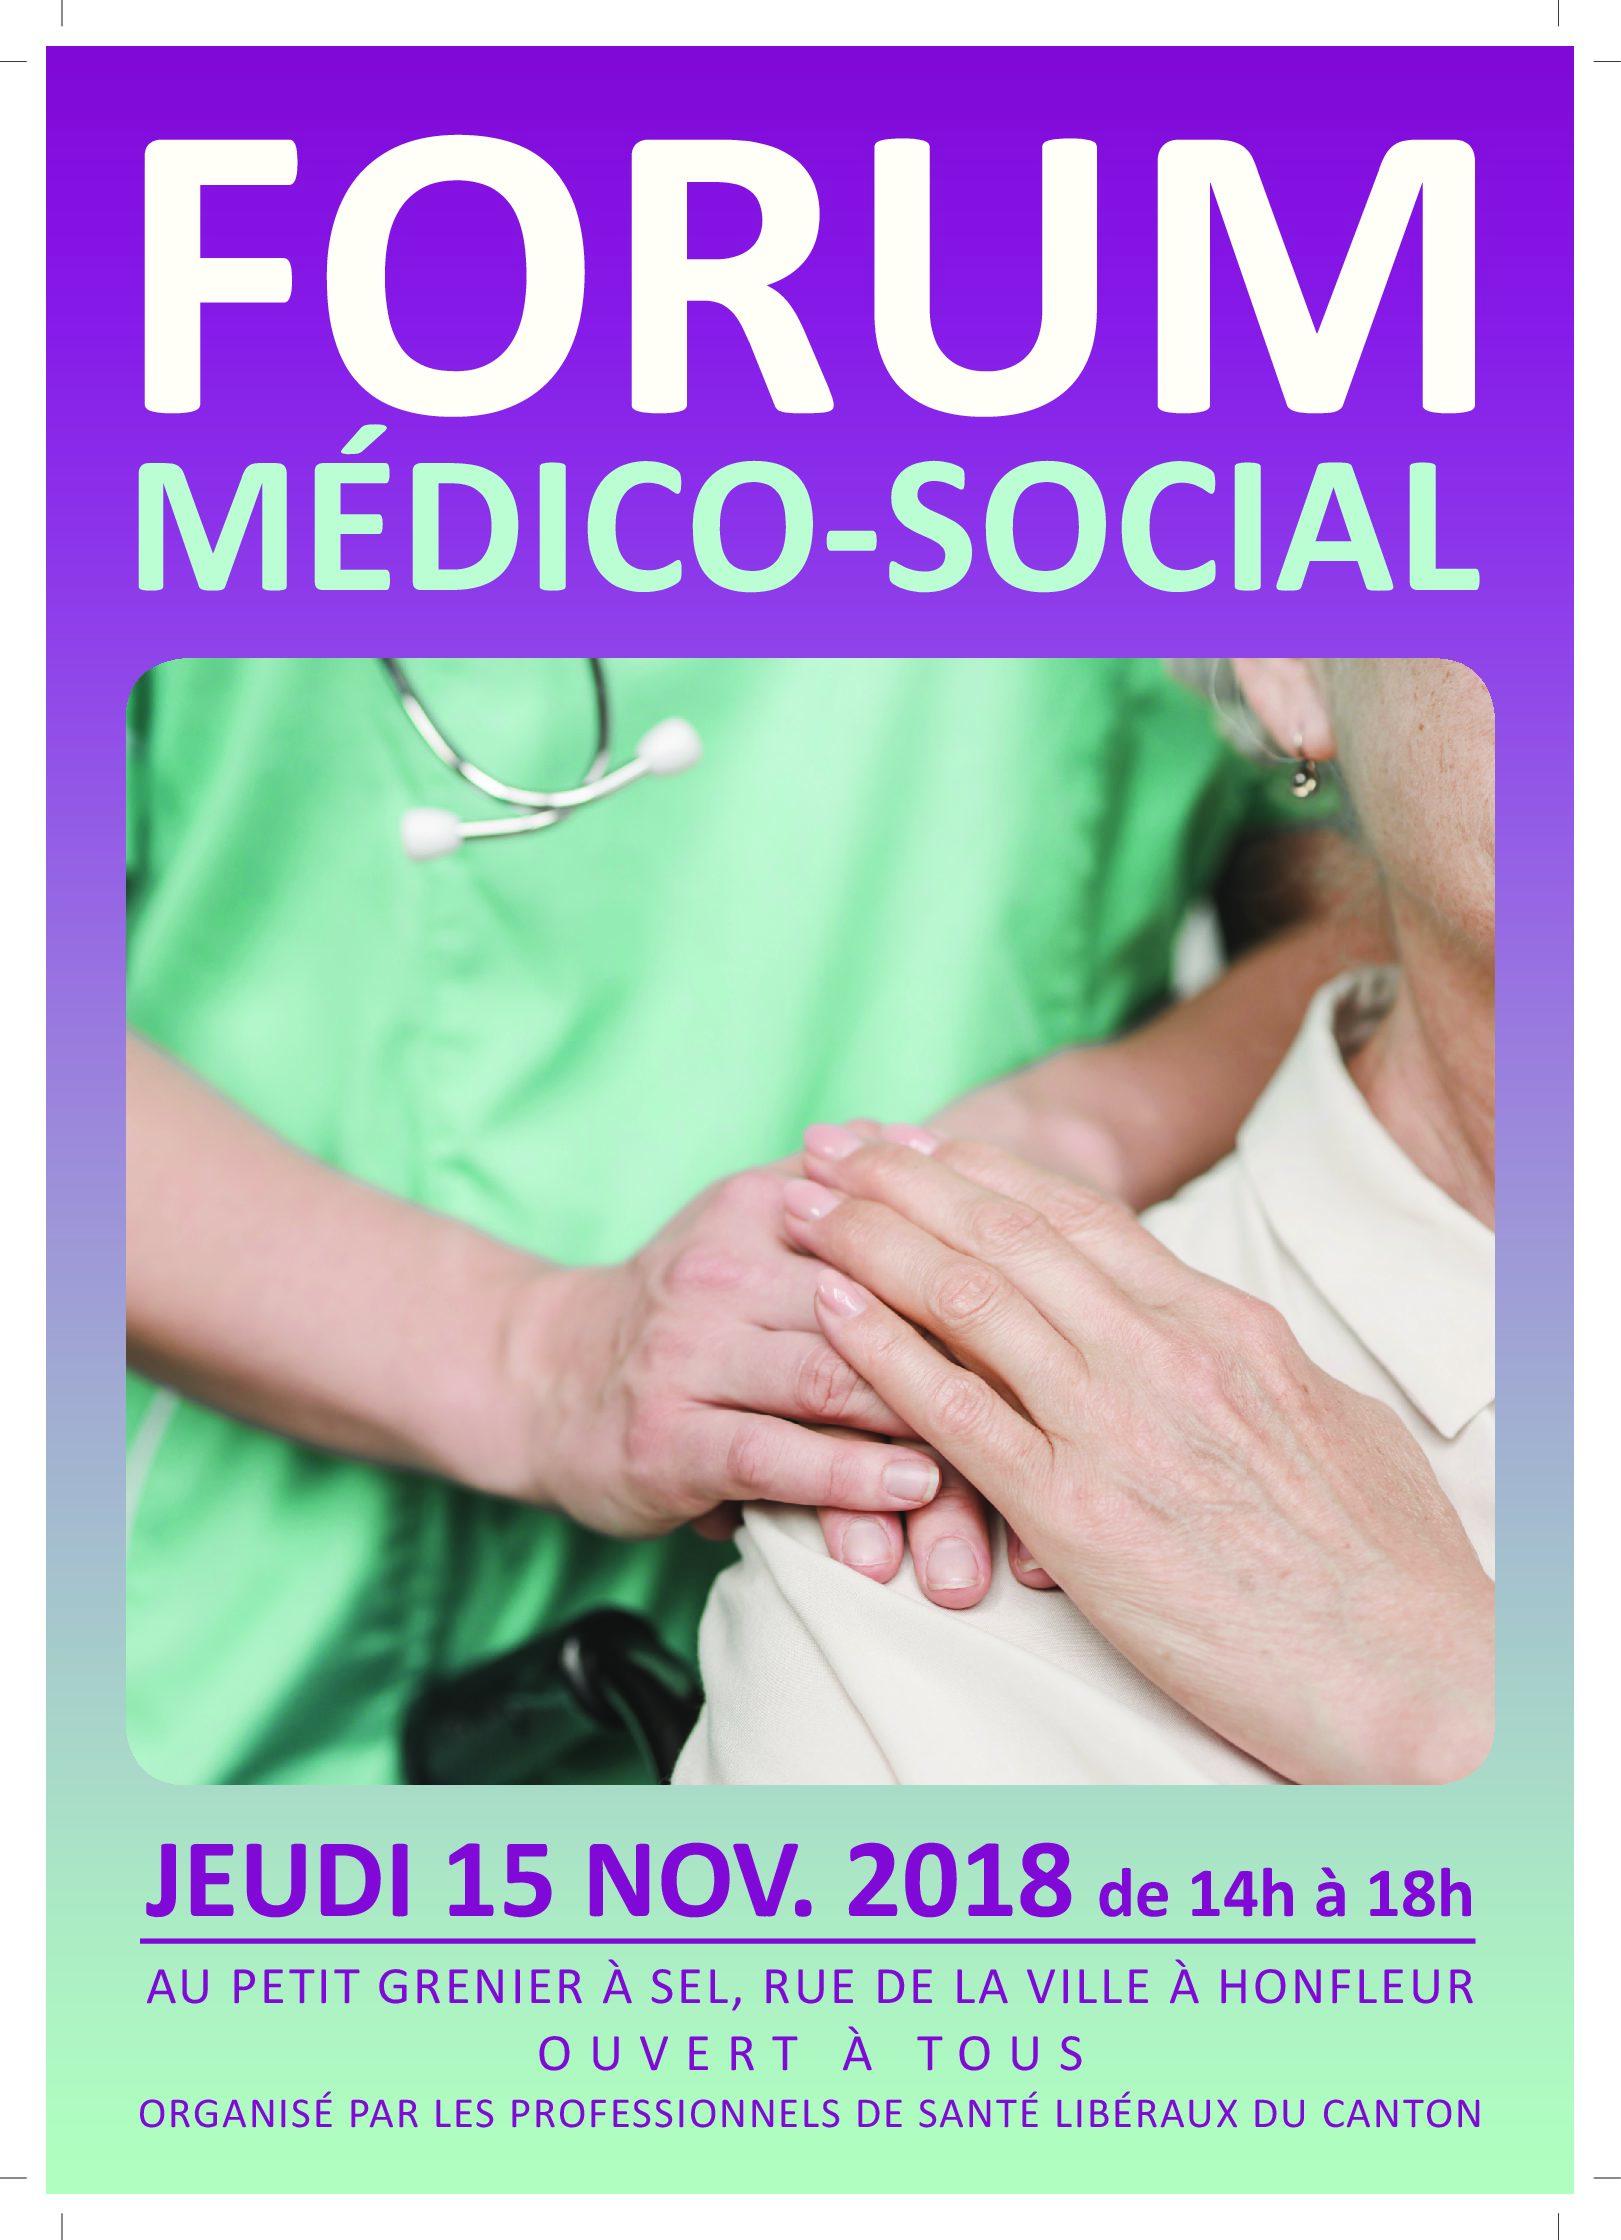 Forum médico-social Honfleur